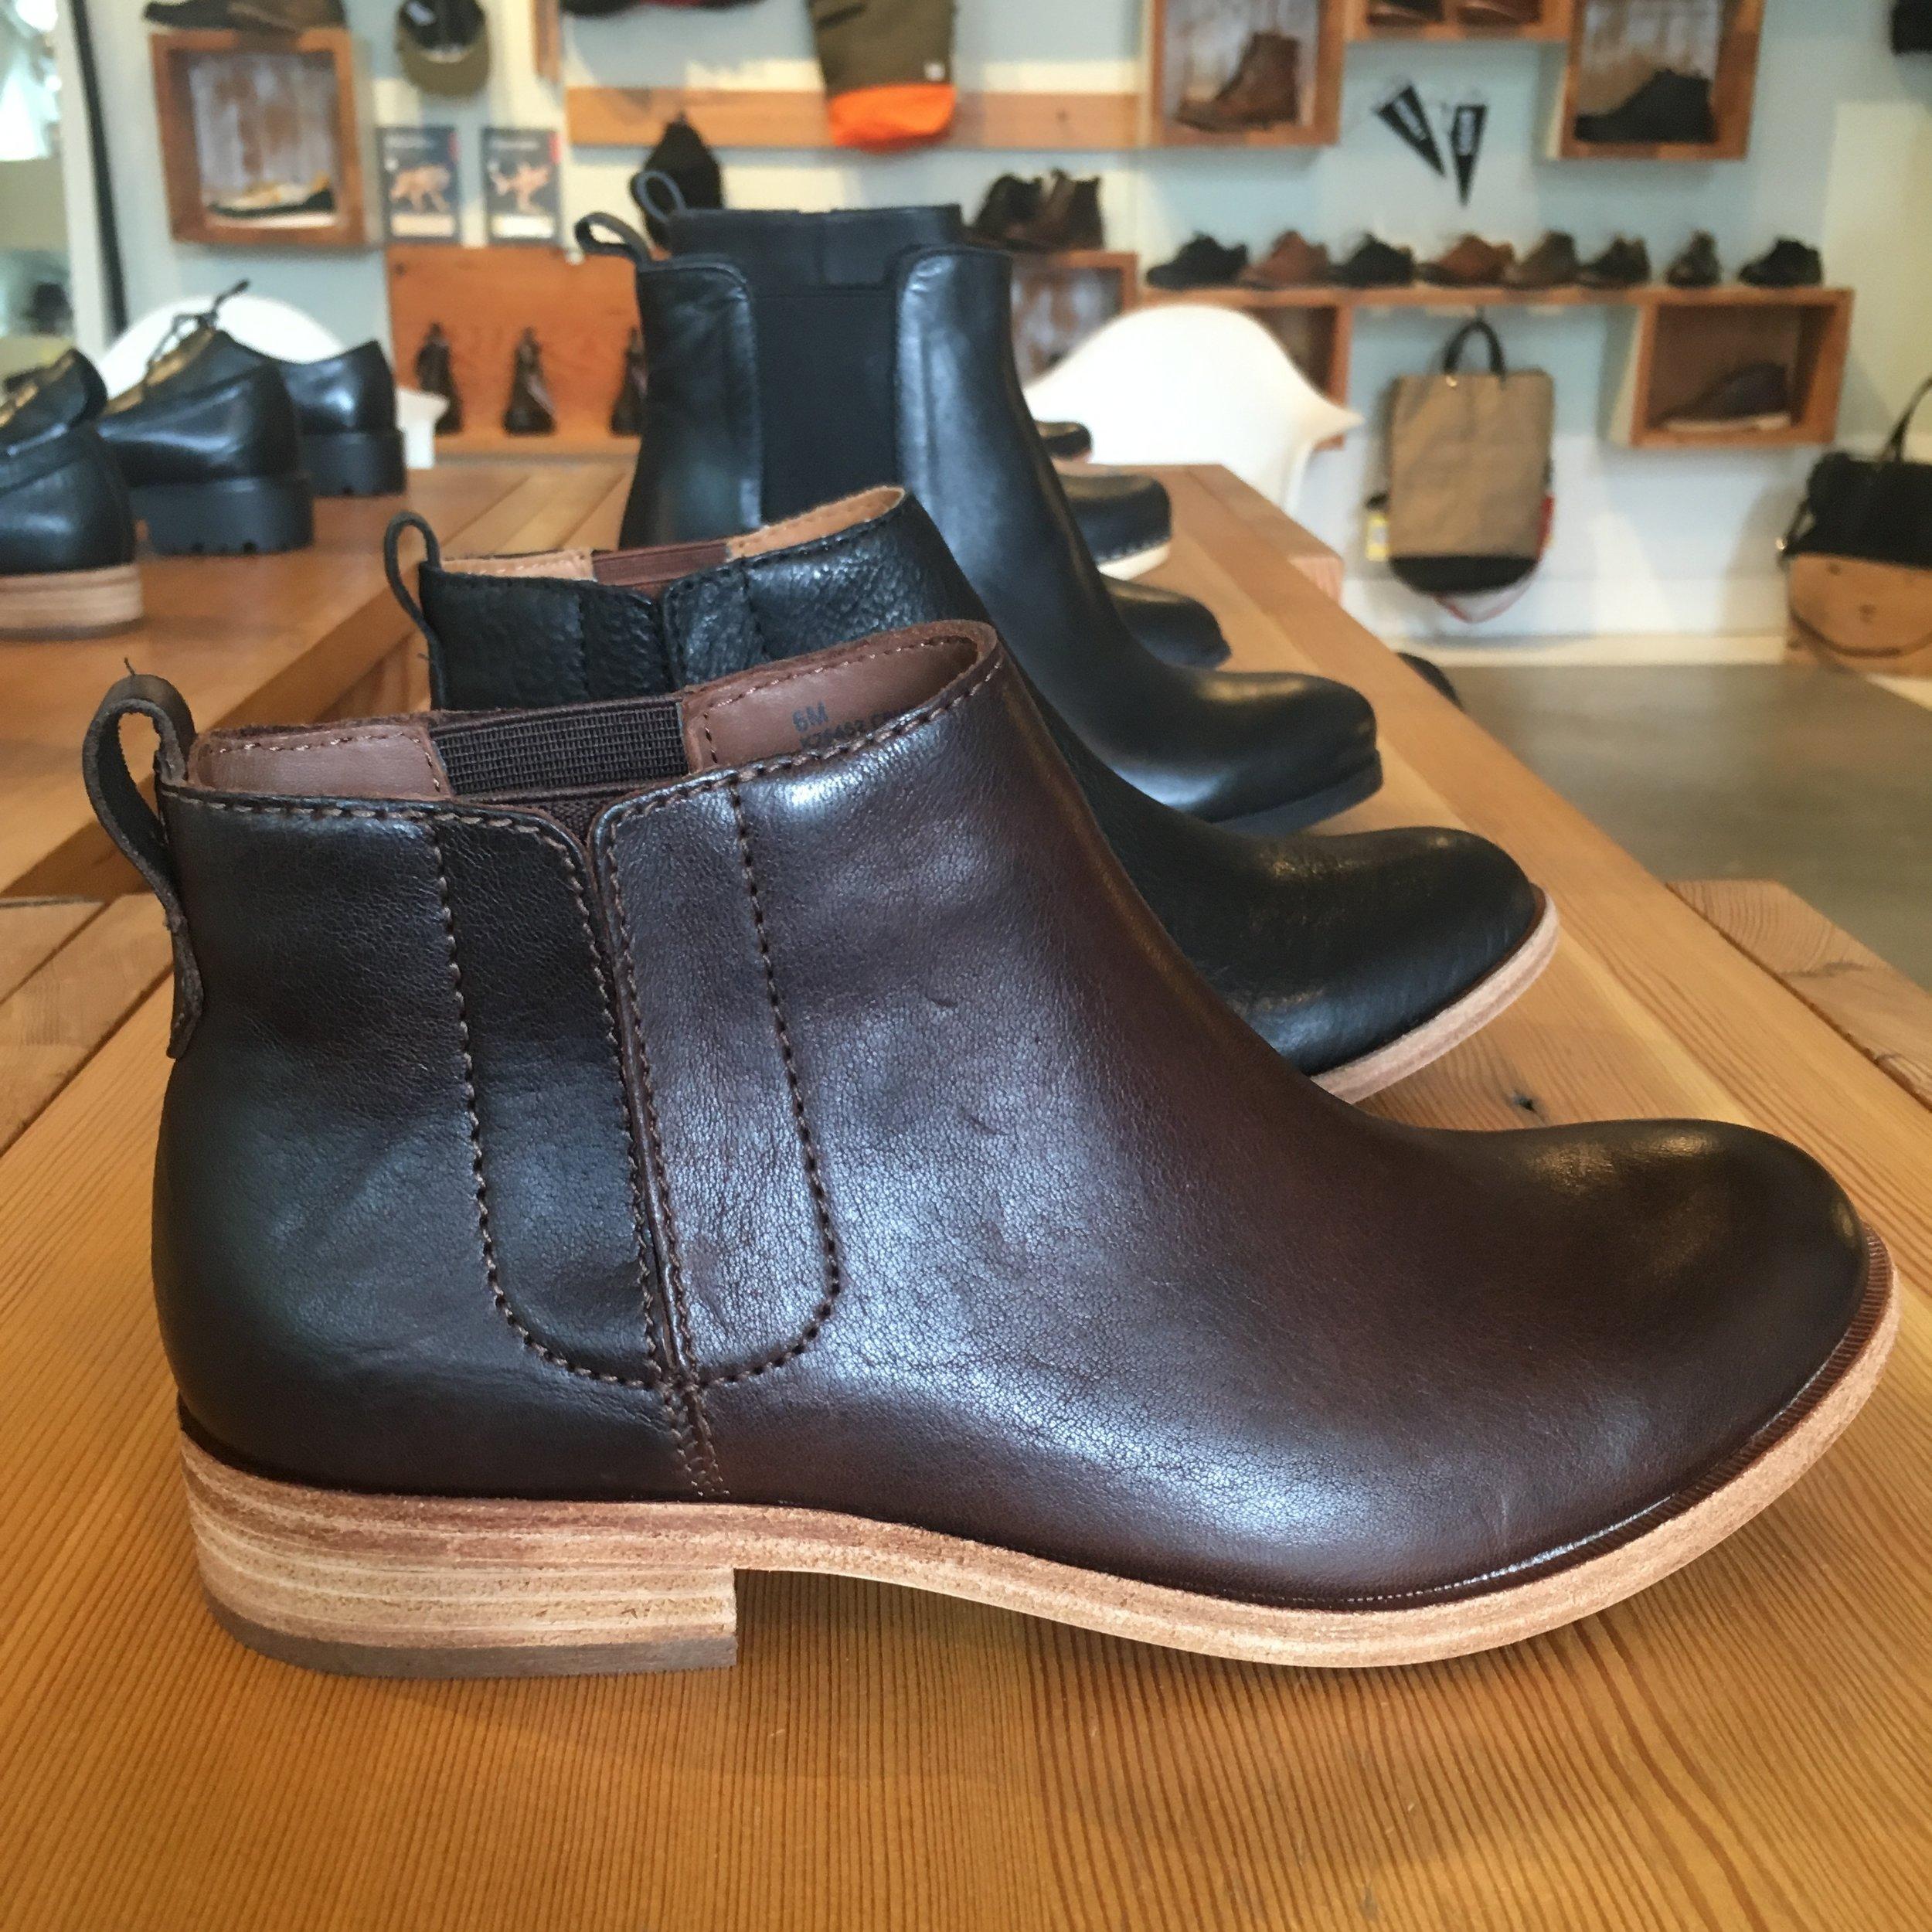 Kork-Ease Velma Boot, in deep brown and black, $190.00